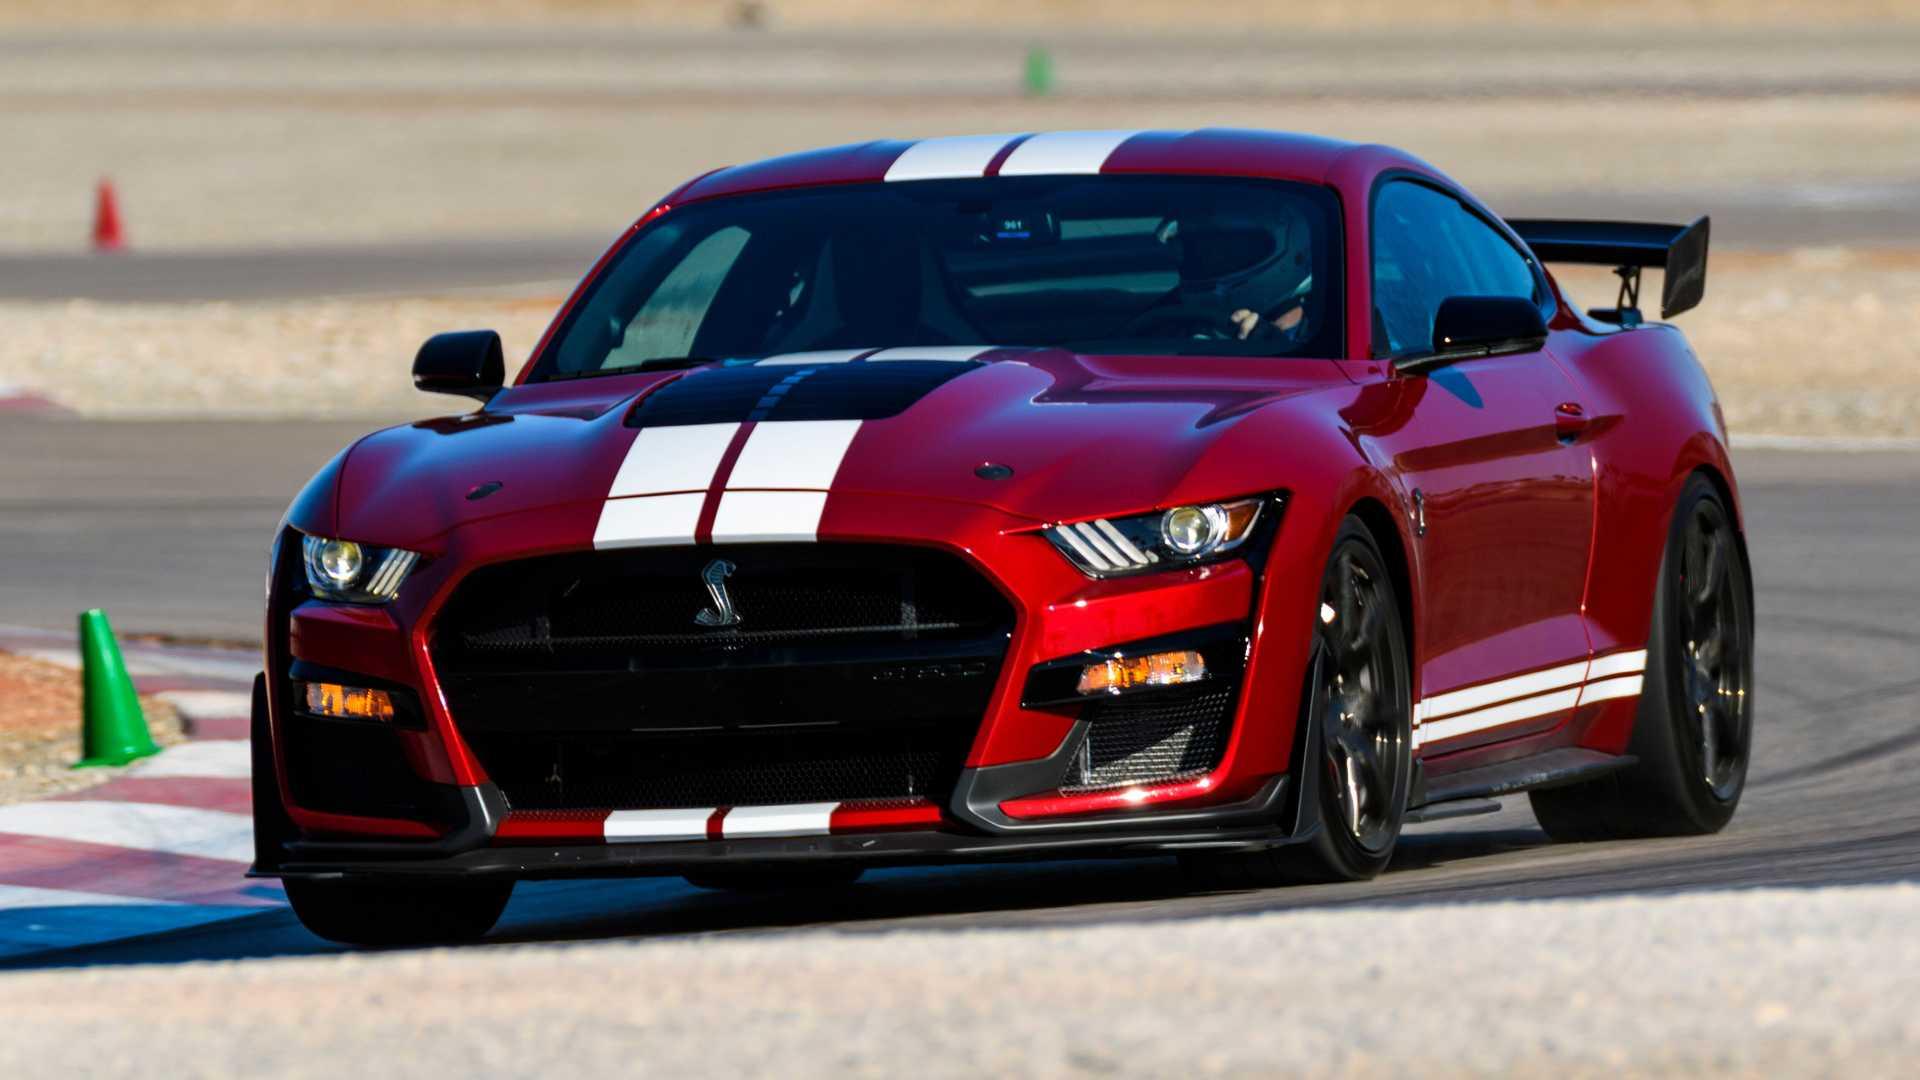 Ford исключает кабриолет Mustang Shelby GT500 и объясняет почему